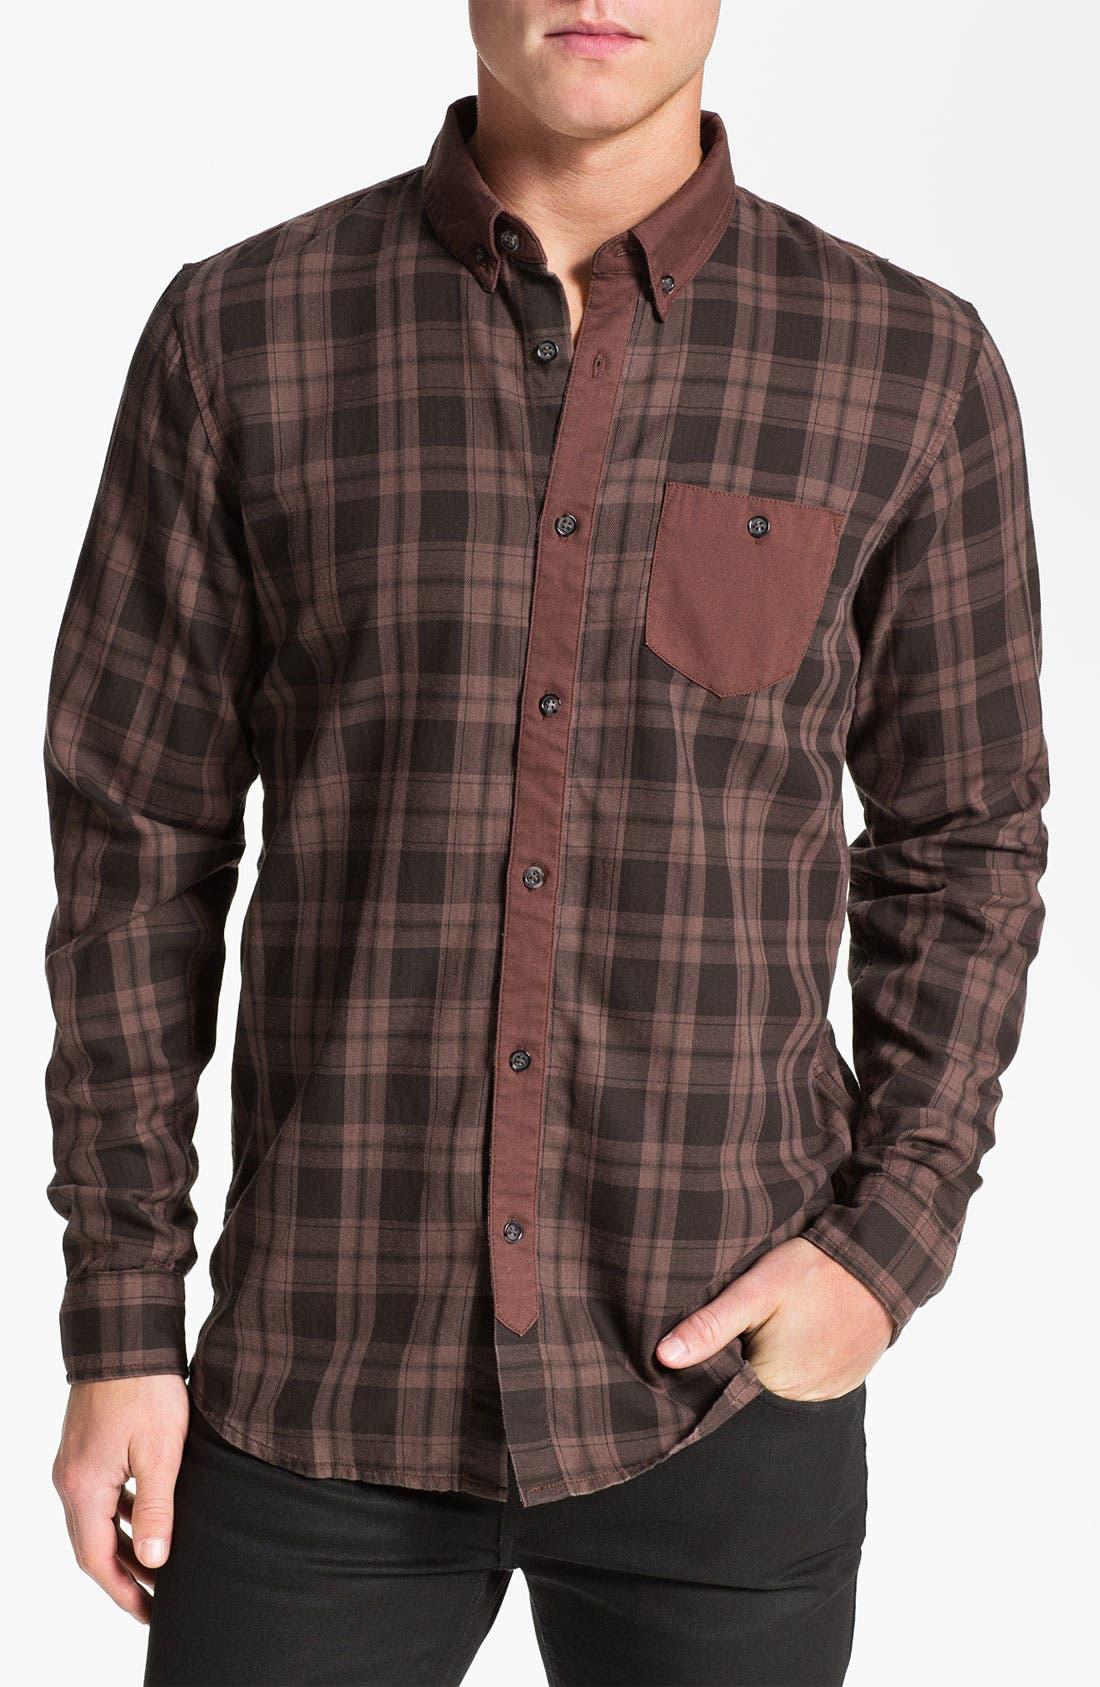 Main Image - 55DSL 'Stenperl' Plaid Woven Shirt